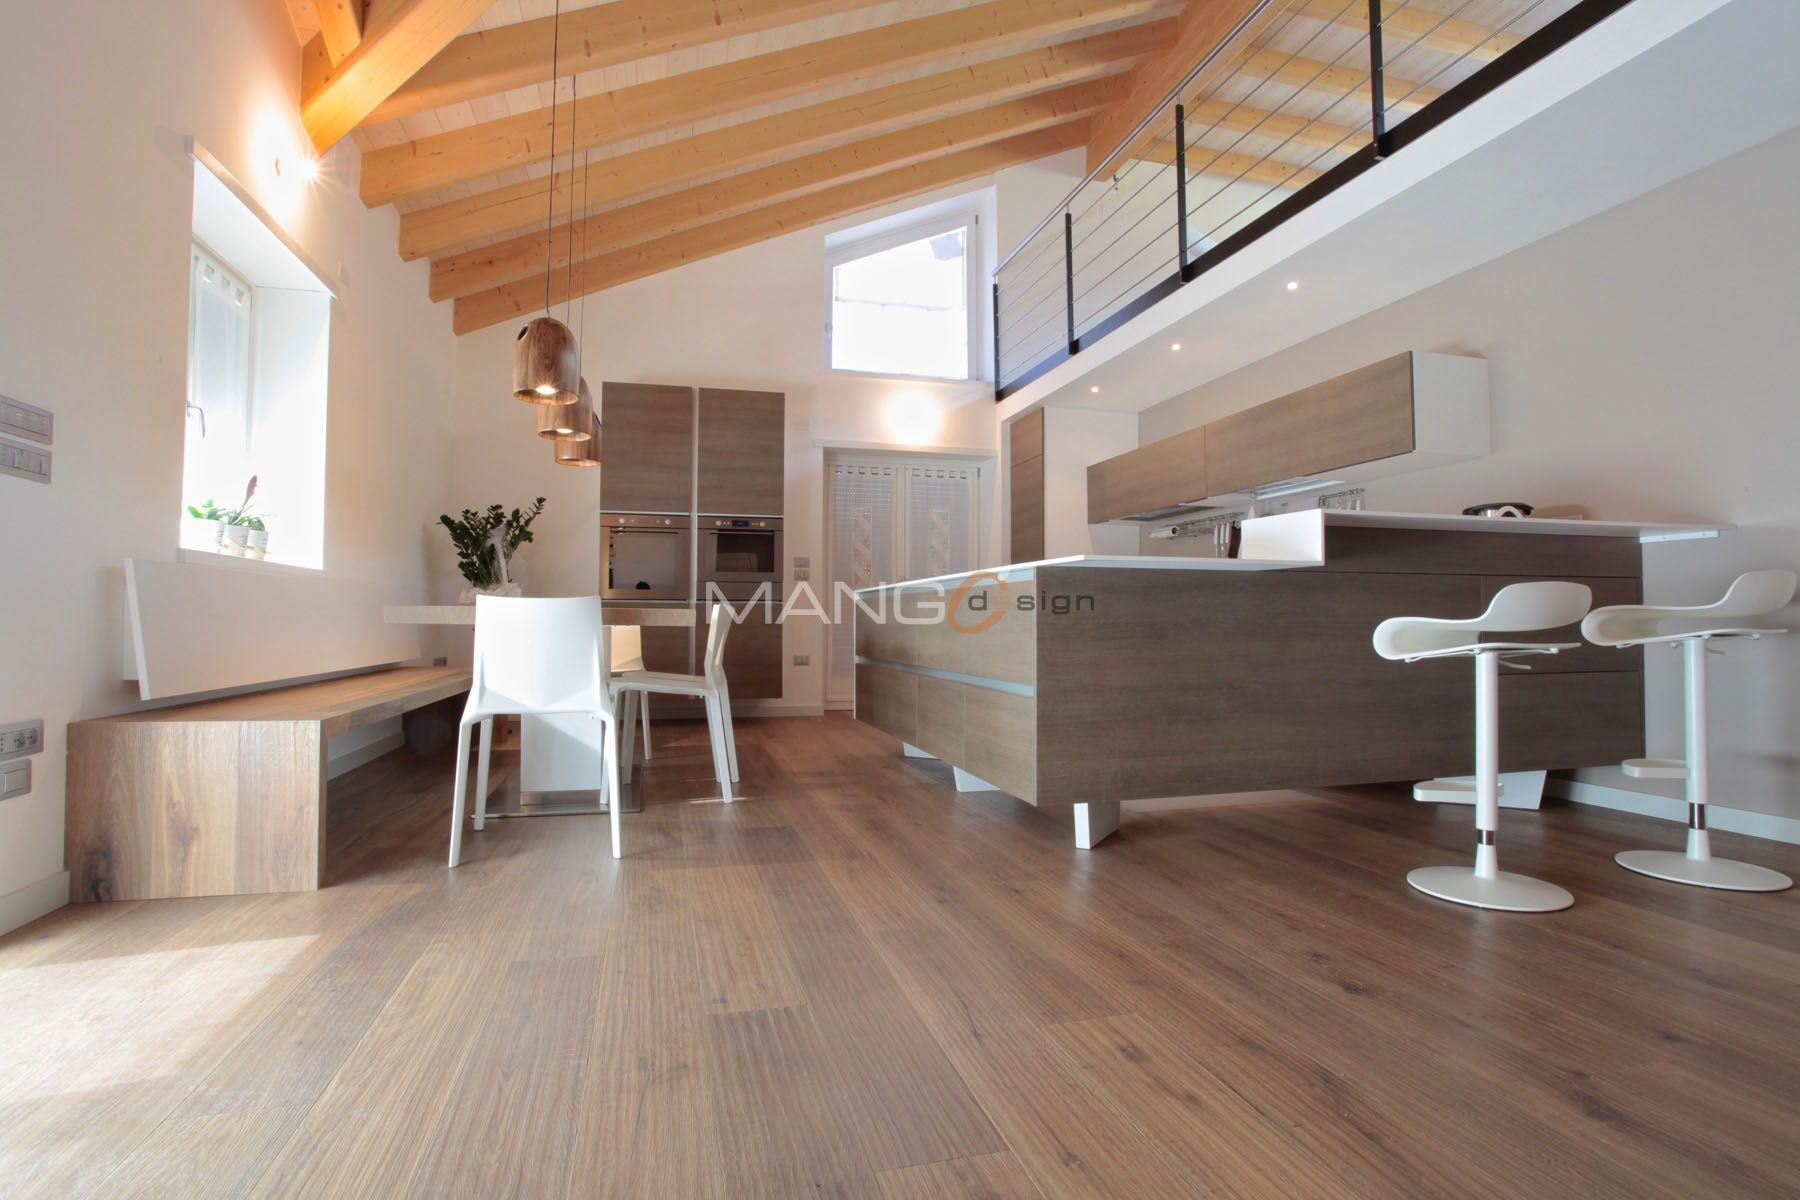 panca tavolo design - buscar con google | arredamento | pinterest ... - Tavoli Cucina Design